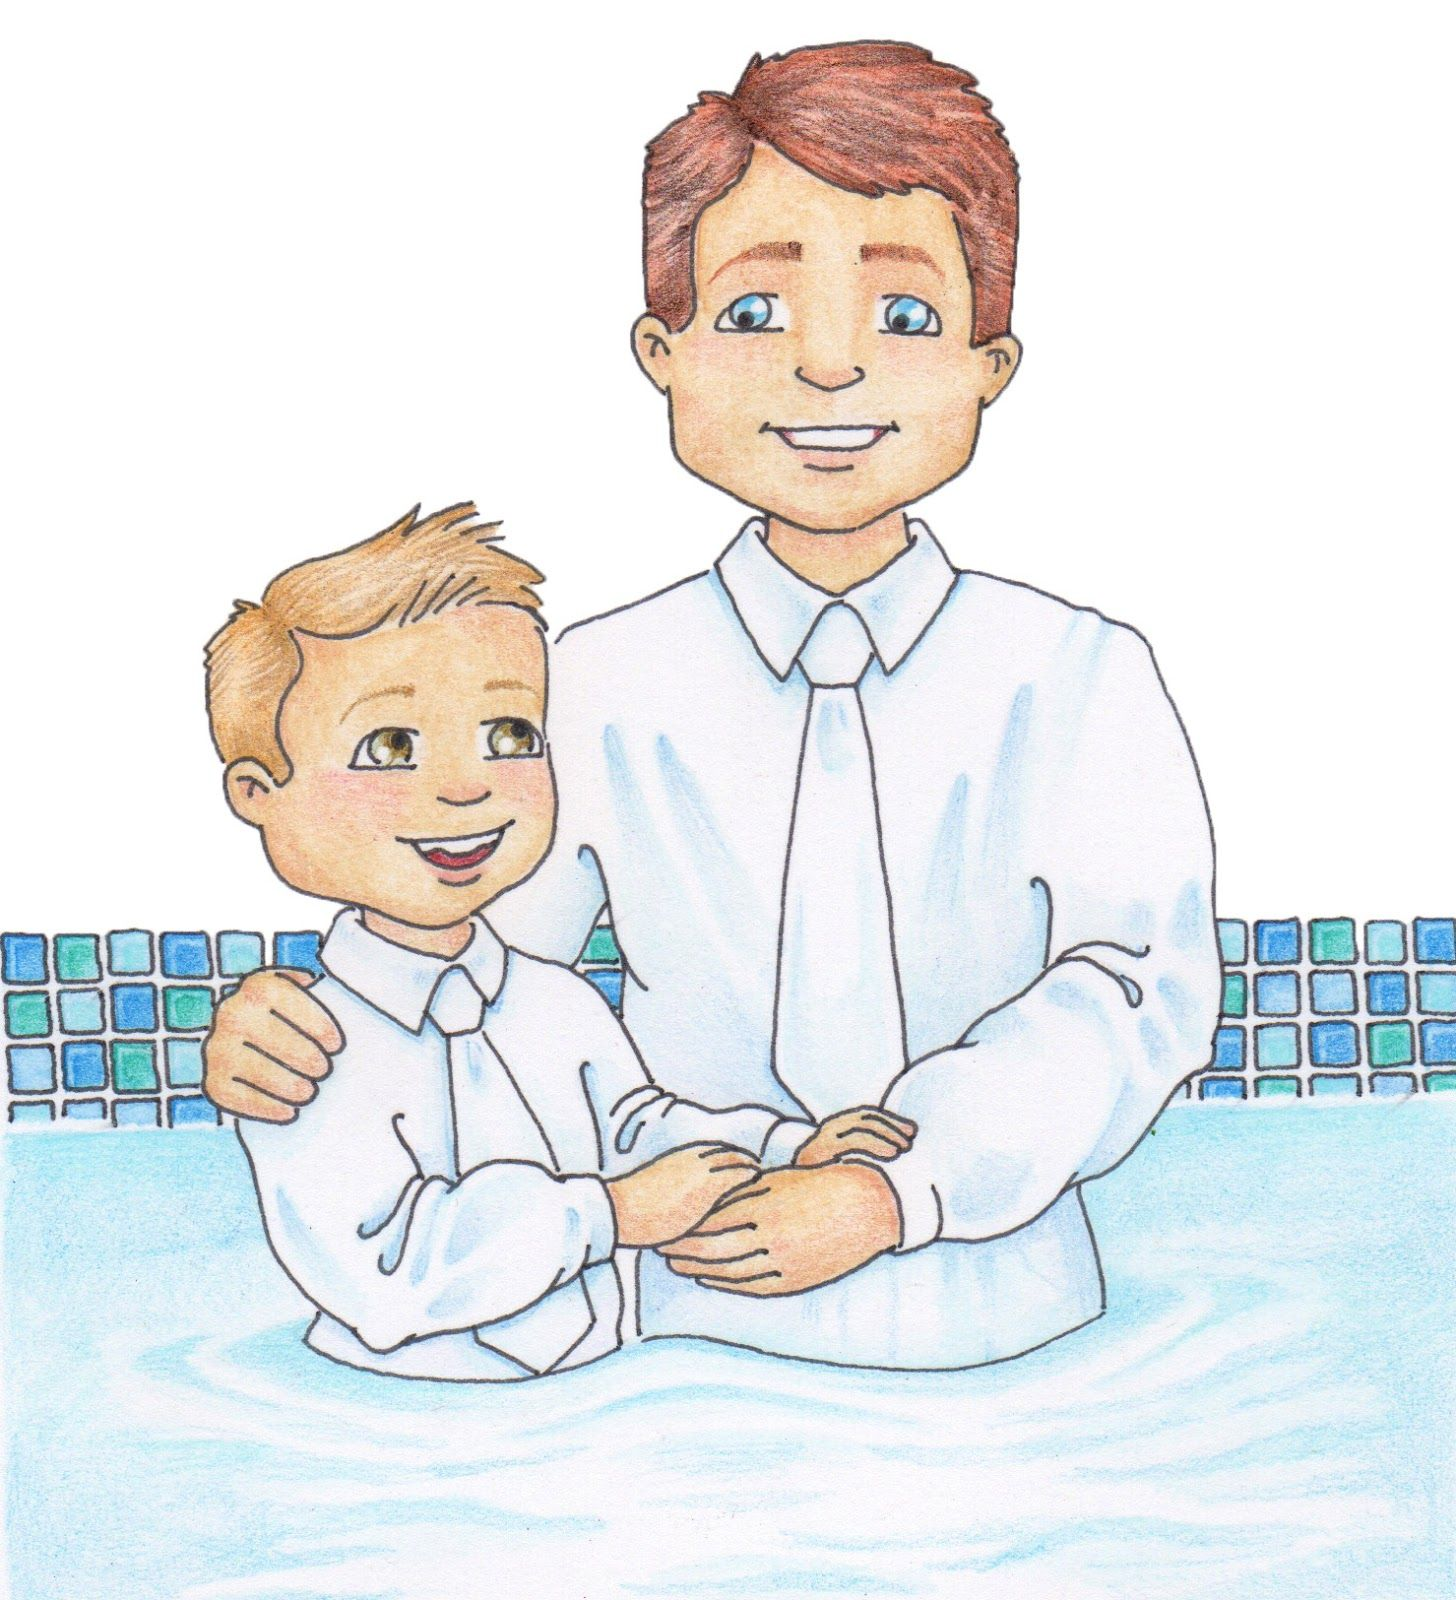 baptism jpeg 1 456 1 600 pixels church teaching helps activity rh pinterest com baptism clip art adult girl LDS Baptism Program